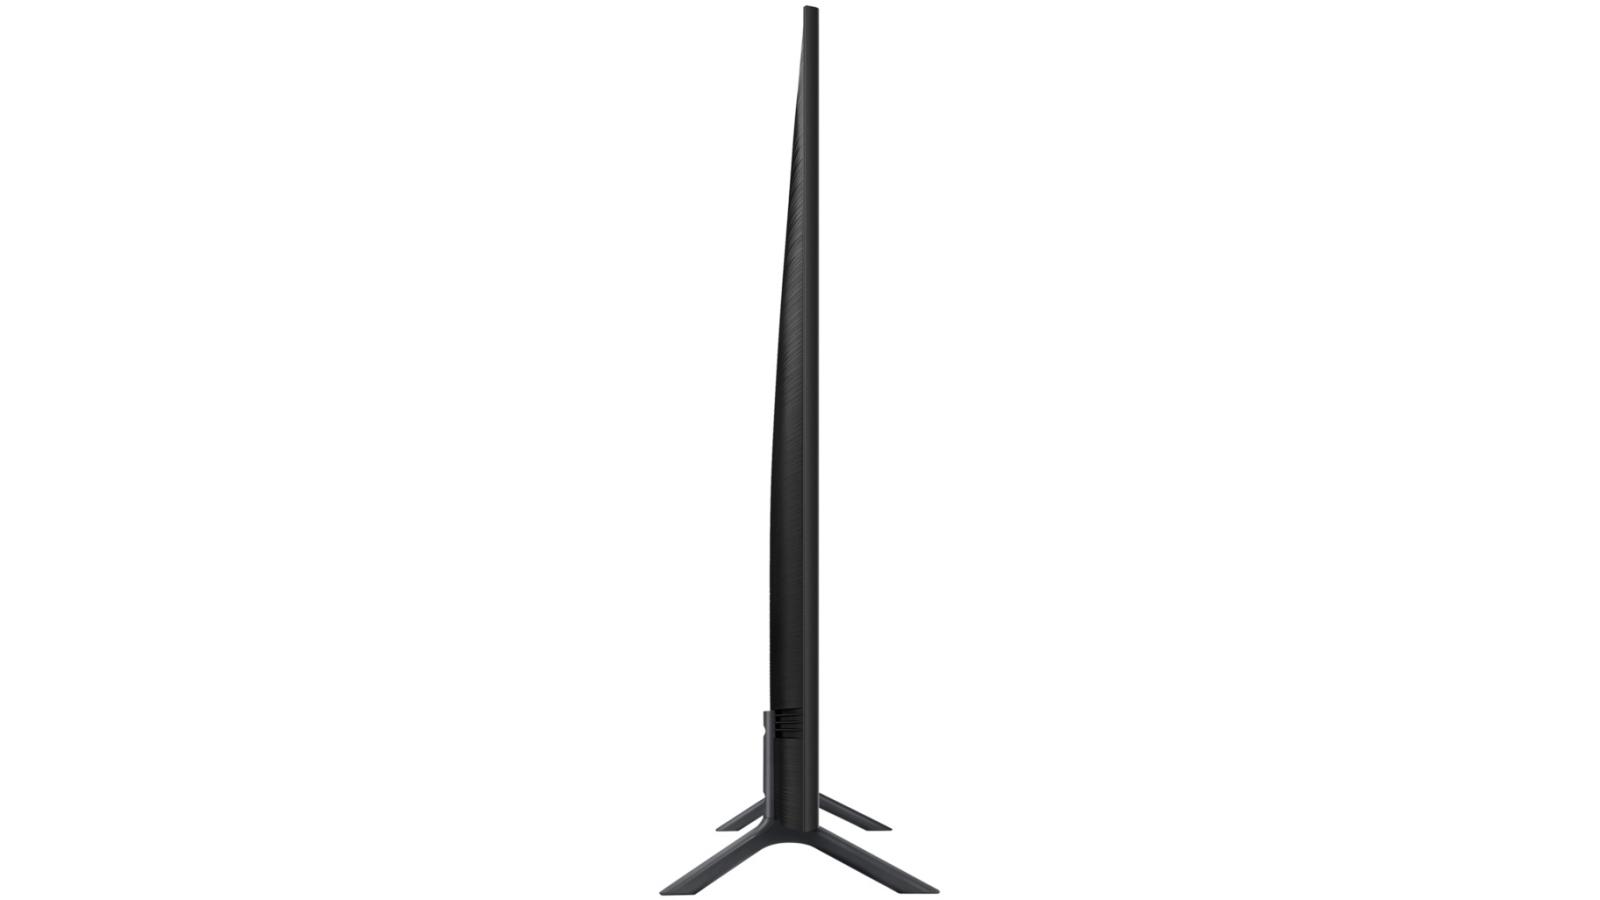 Samsung 65-inch RU7100 4K UHD LED LCD Smart TV